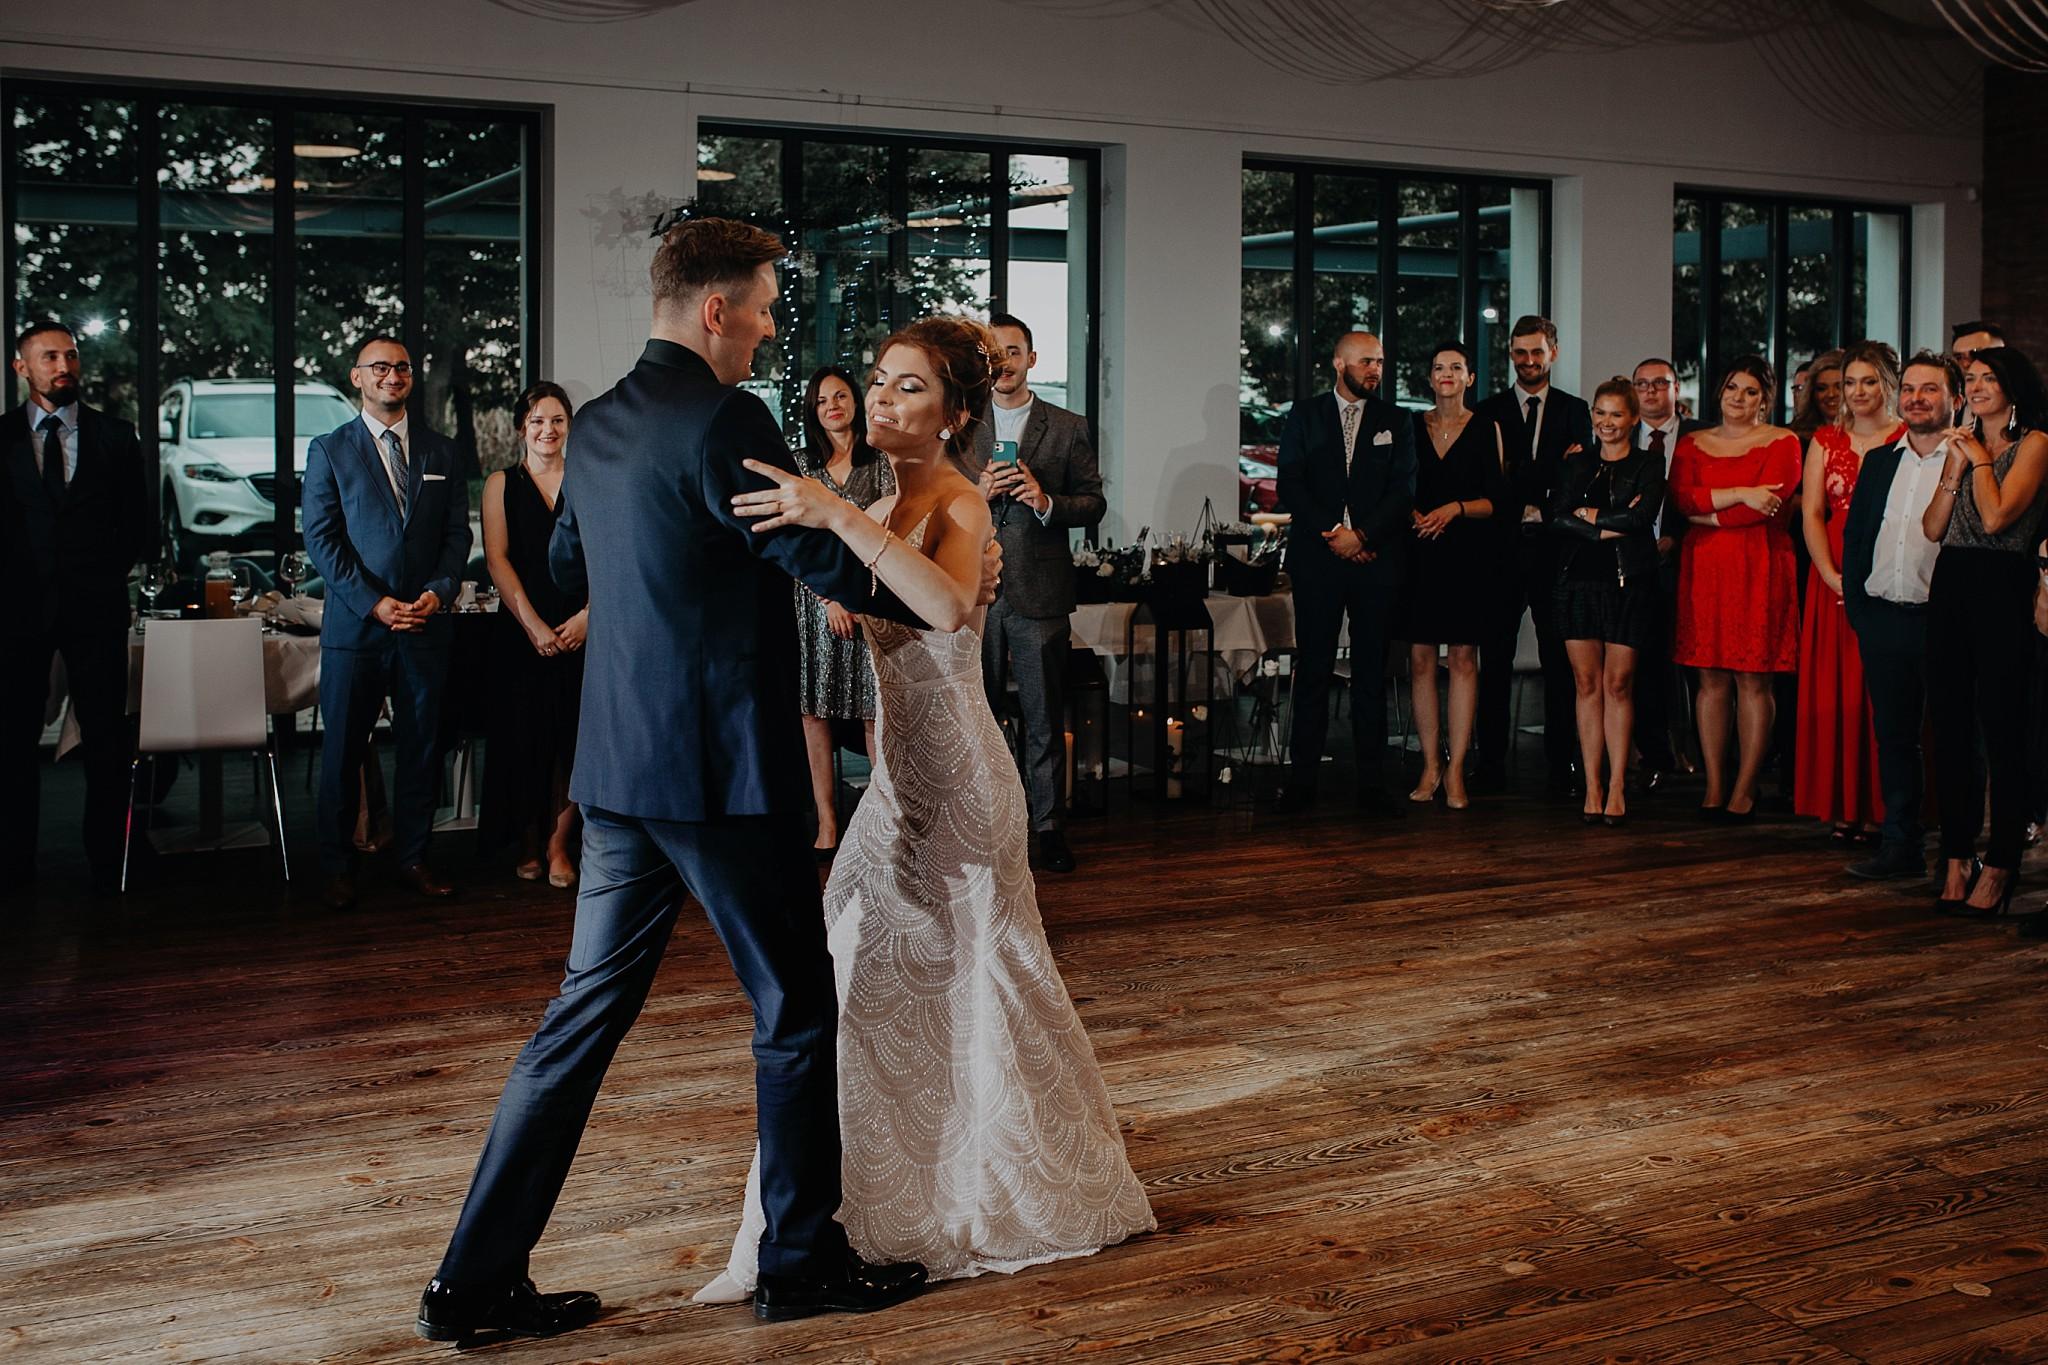 fotograf poznan wesele dobra truskawka piekne wesele pod poznaniem wesele w dobrej truskawce piekna para mloda slub marzen slub koronawirus slub listopad wesele koronawirus 316